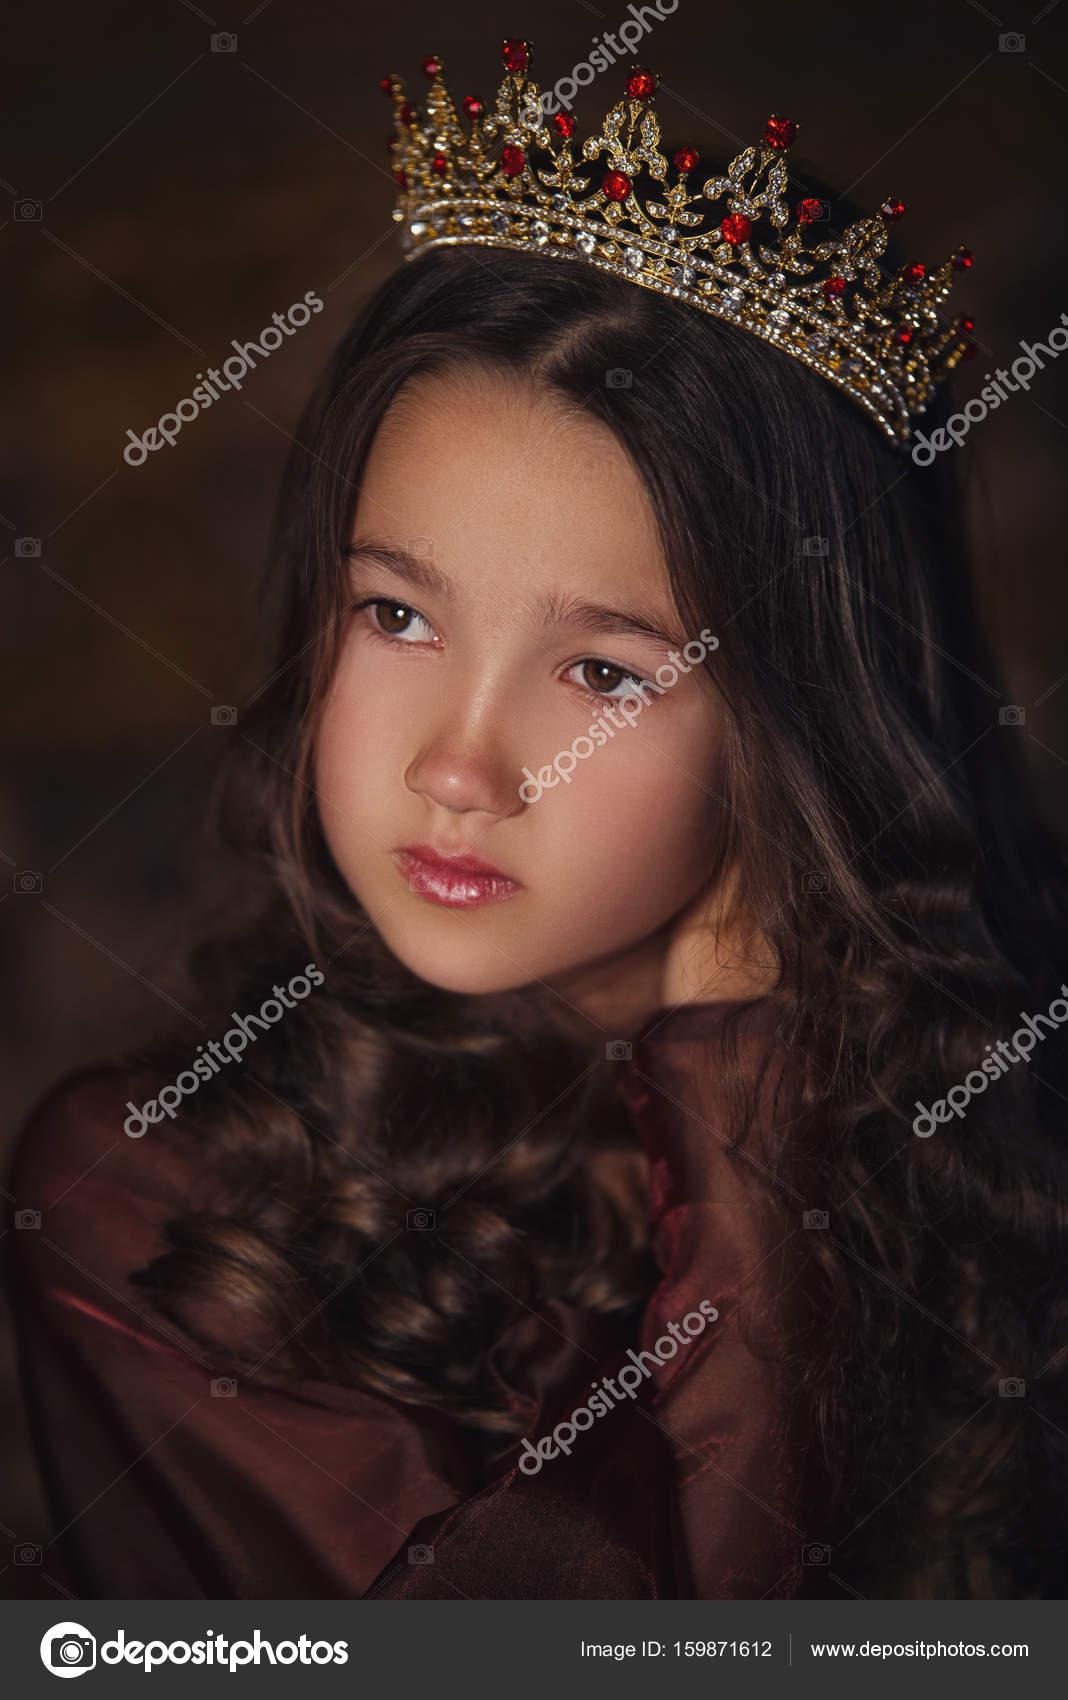 8a9c204b962 Πορτραίτο του χαριτωμένο κορίτσι φοράει μια κορώνα. Νεαρή βασίλισσα ή  πριγκίπισσα — Φωτογραφία Αρχείου